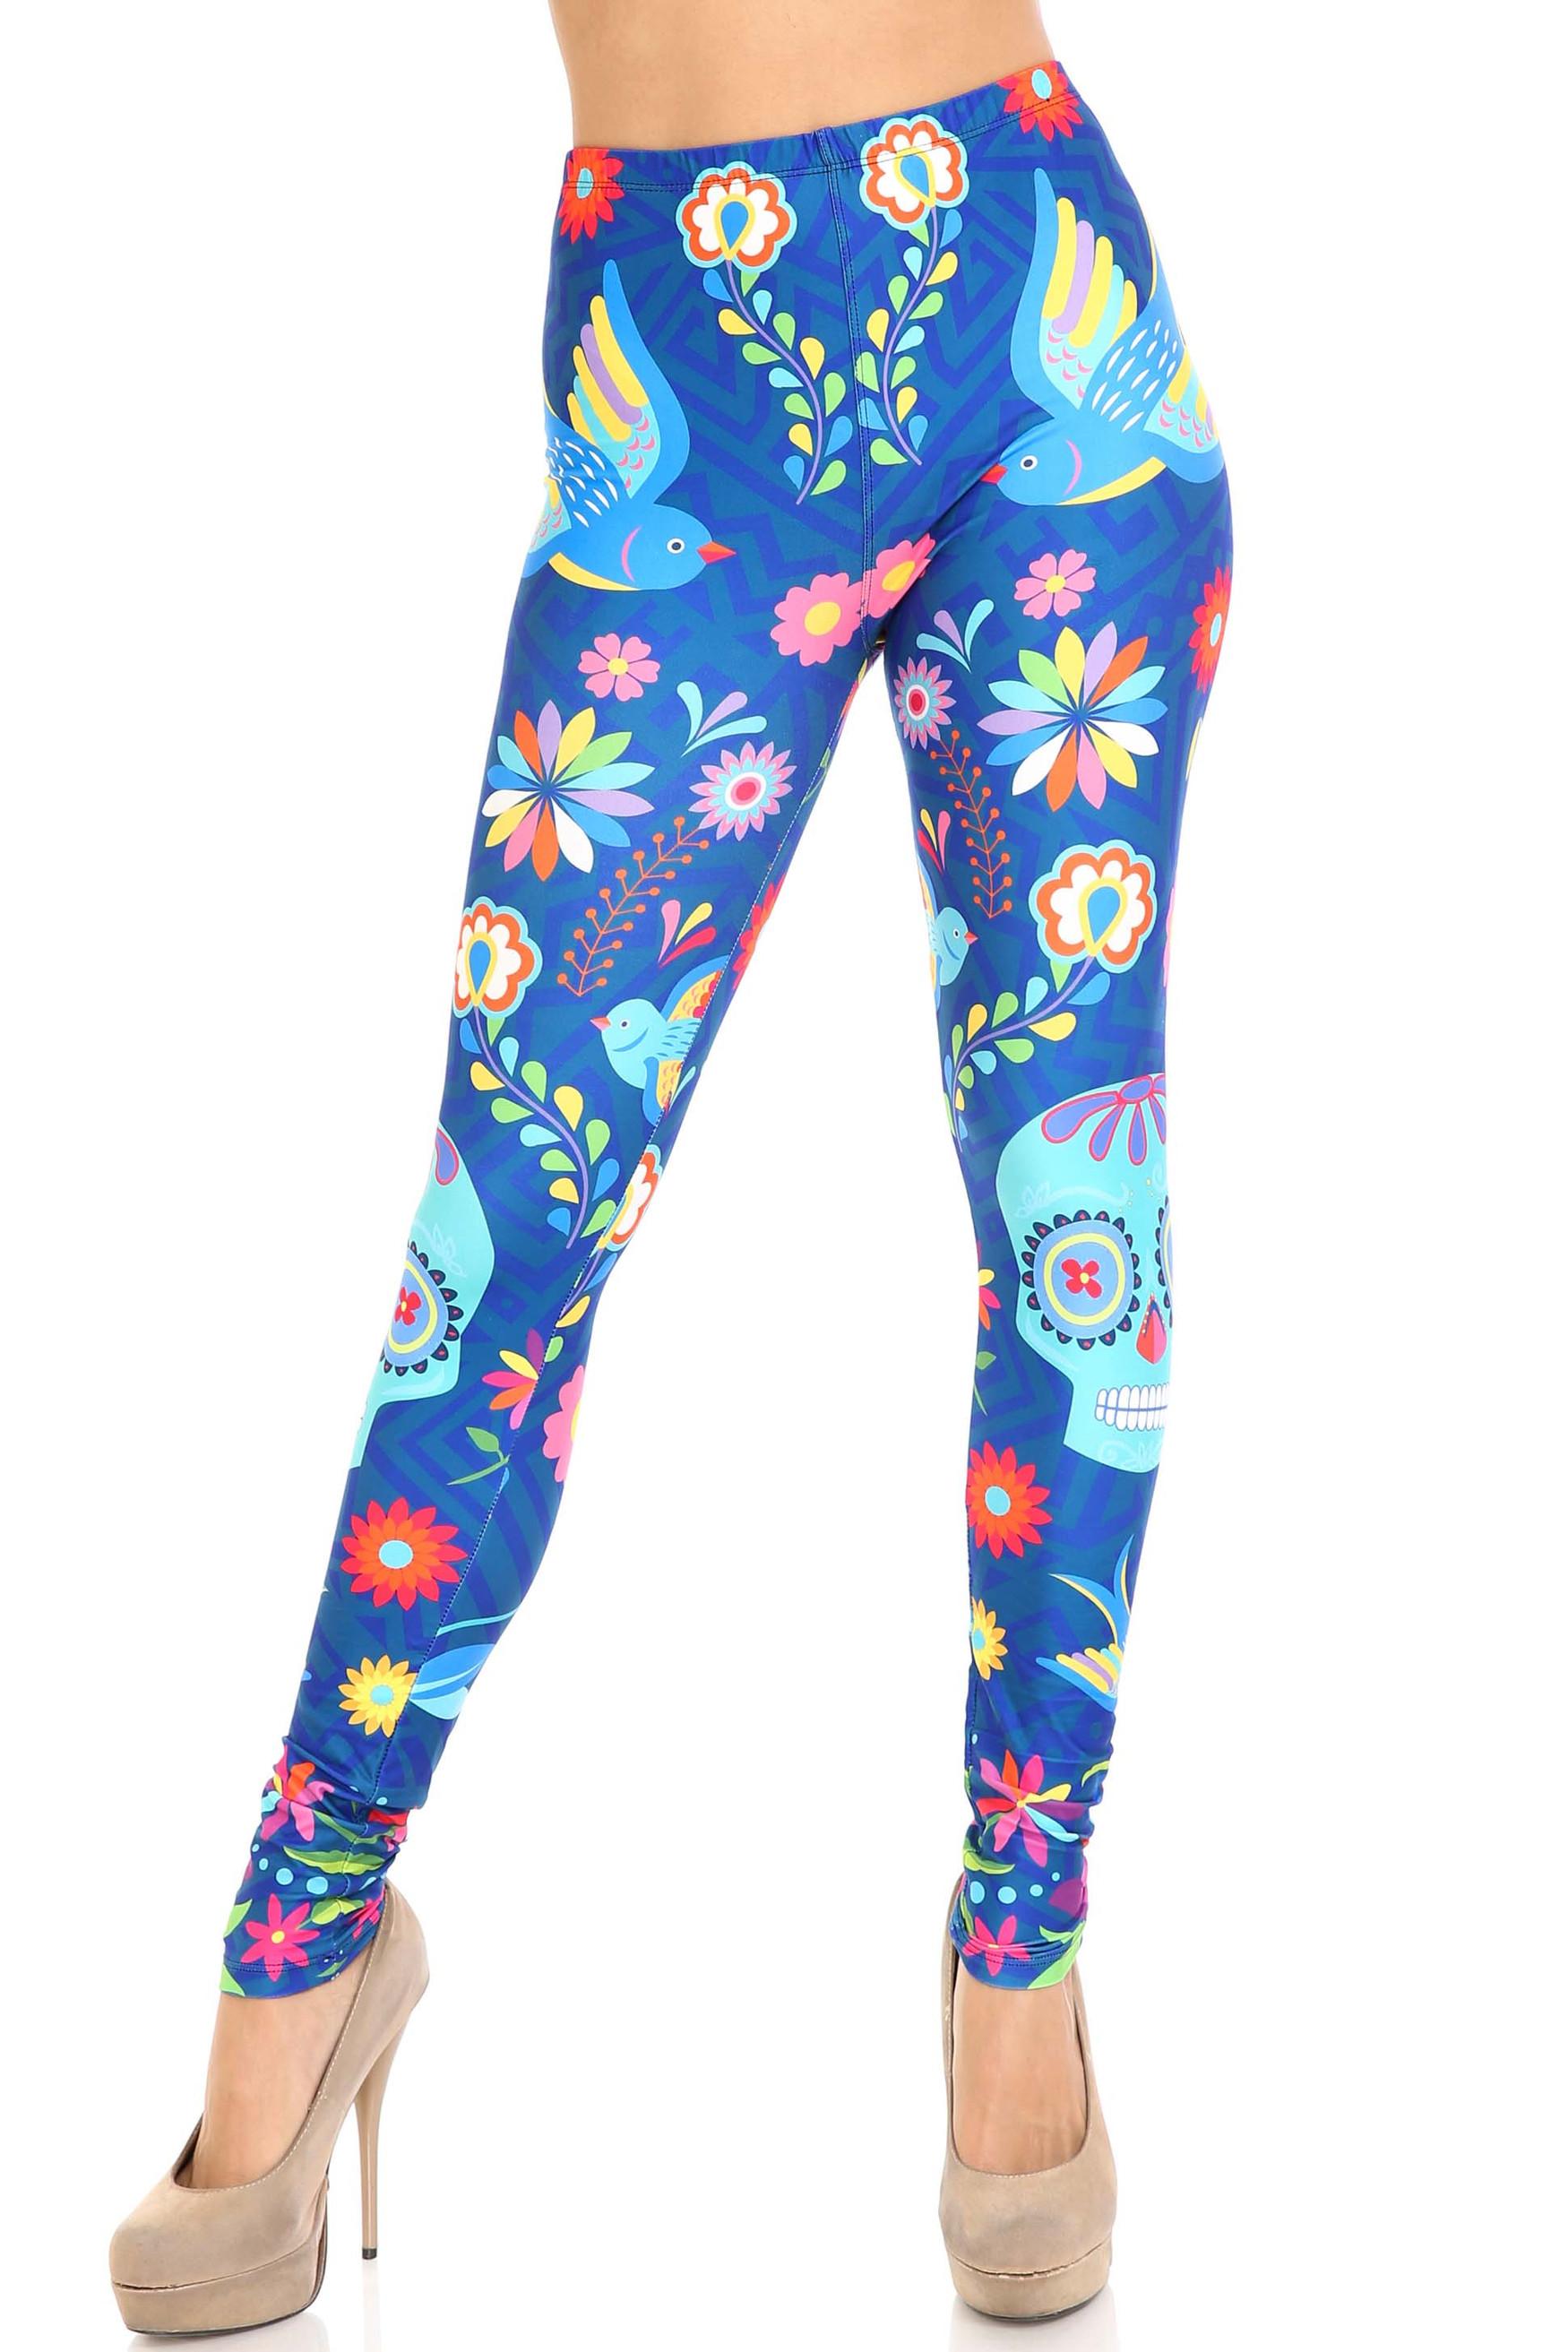 Creamy Soft Garden of Eden Sugar Skull Leggings - USA Fashion™